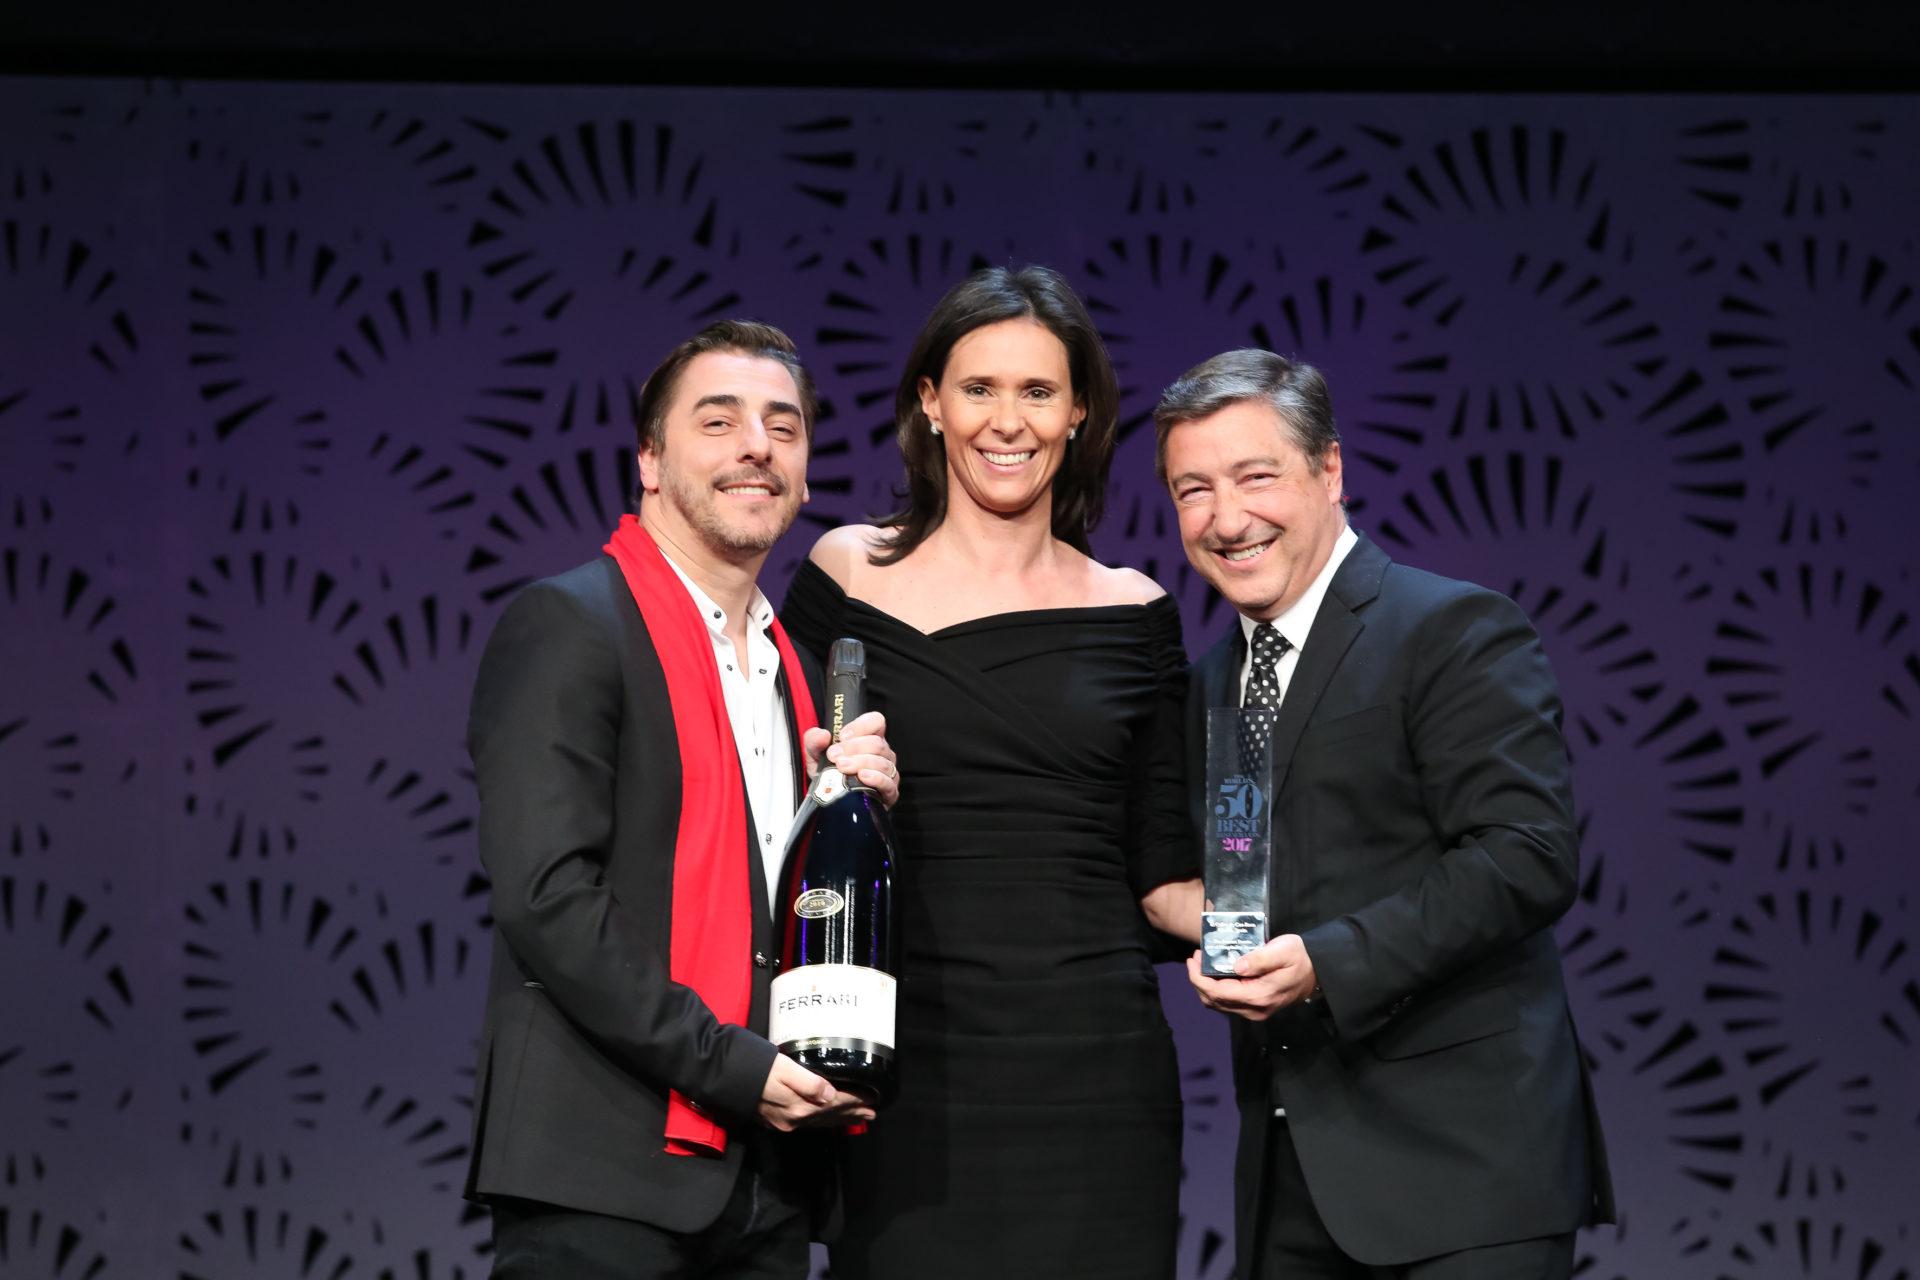 Jordi y Joan Roca recogen el Ferrari Trento Art Of Hospitality Award en el World's 50 Best 2017 (Foto de The World's 50 Best Restaurants)